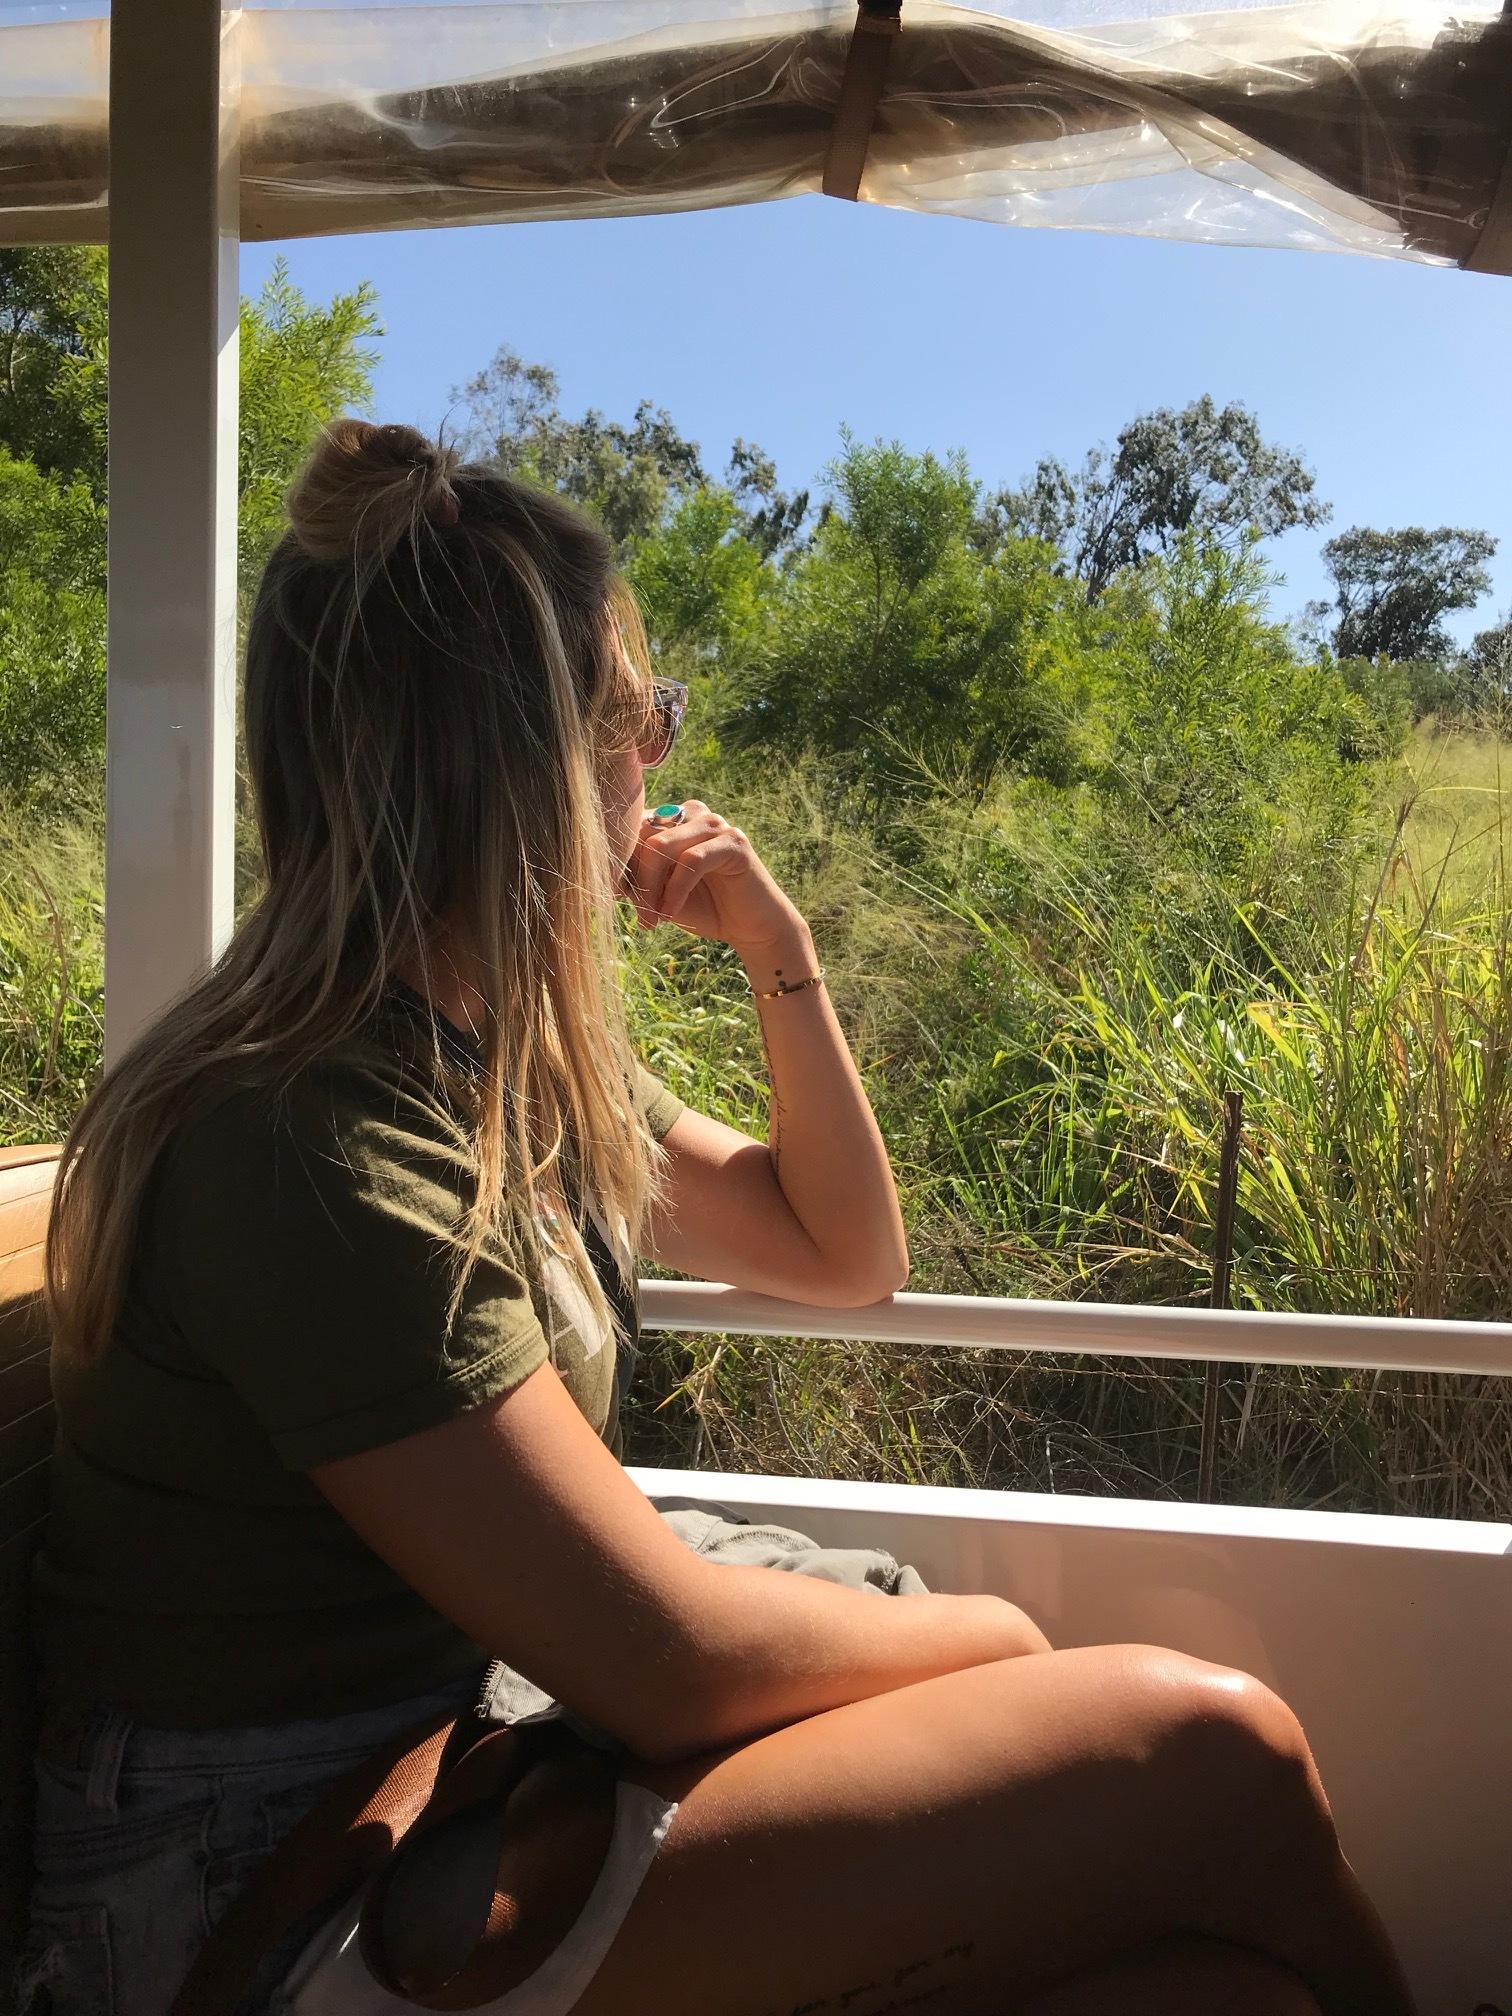 Gazing across the grounds (haha get it) on the newly revamped Kauai Coffee Farm Tour.